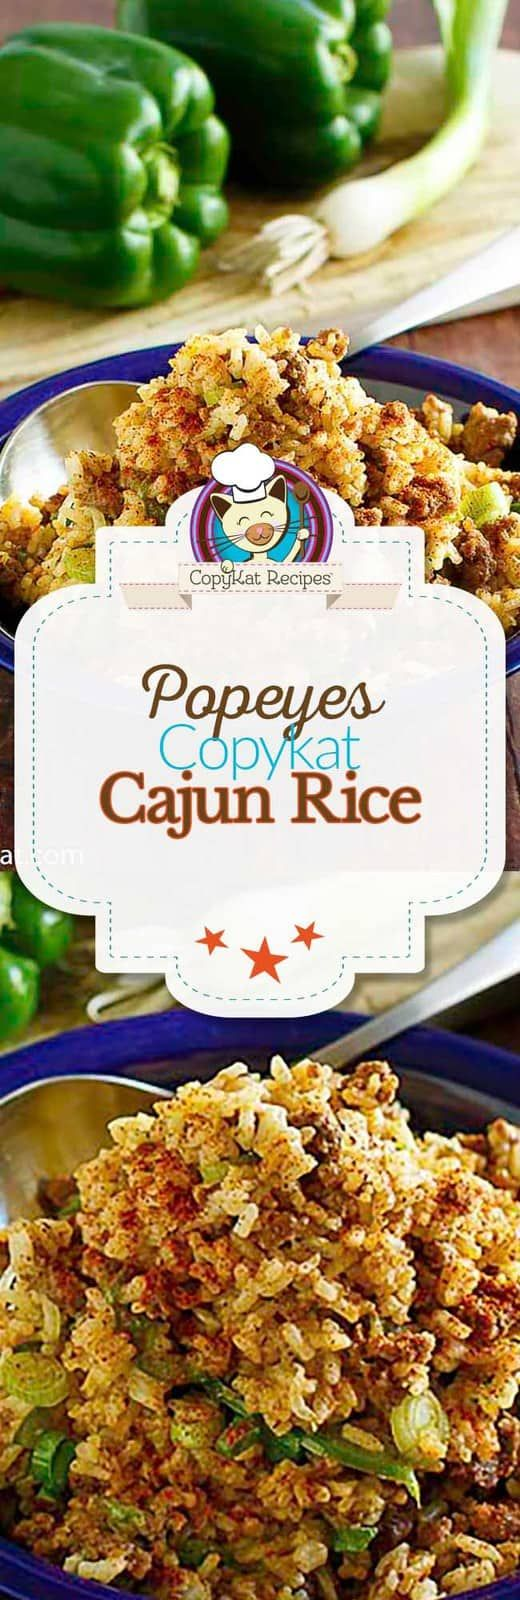 Copycat Popeyes Cajun Rice